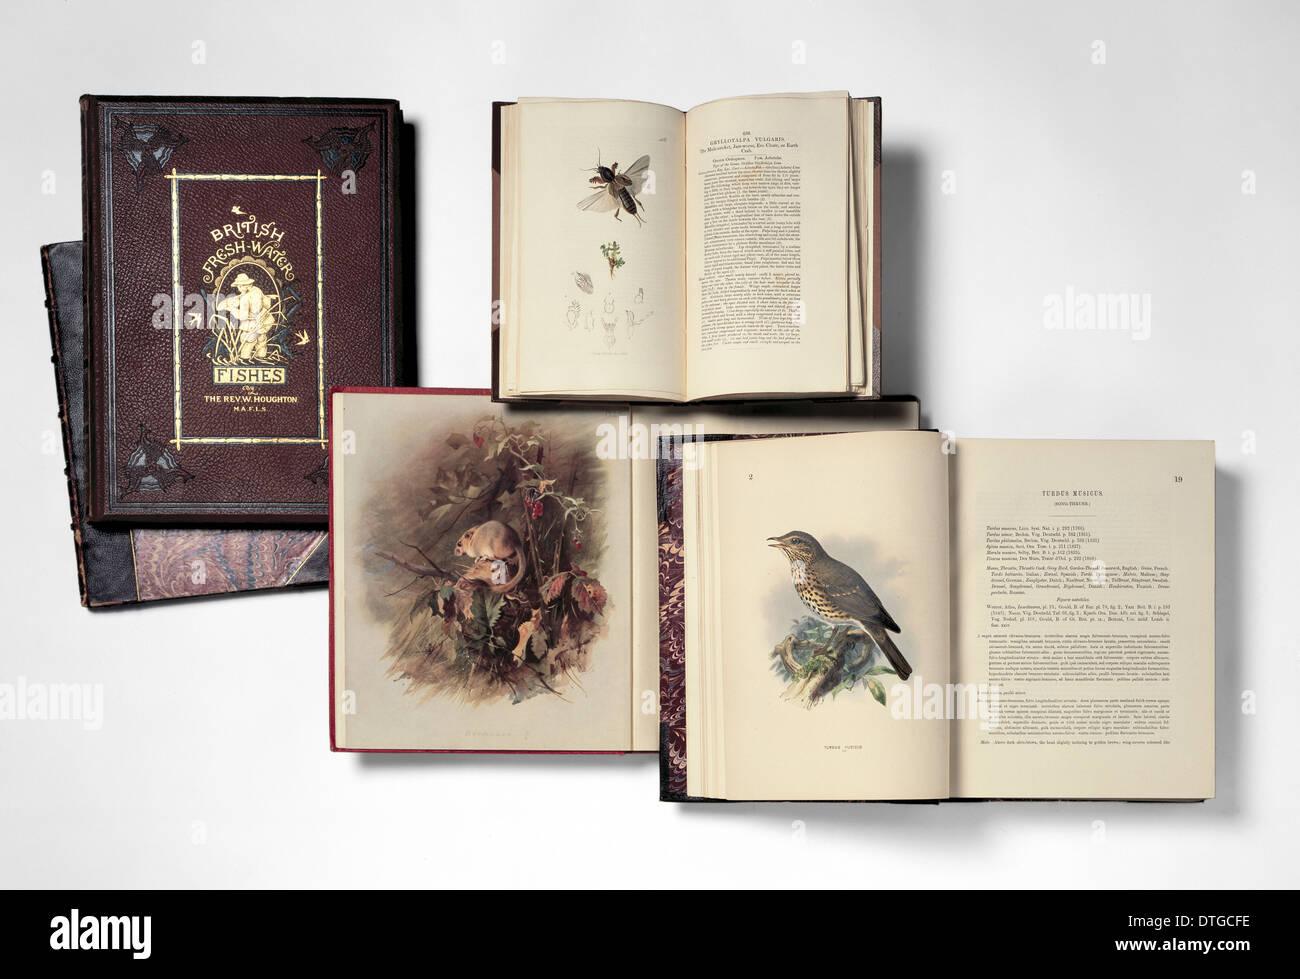 Illustrated books - Stock Image